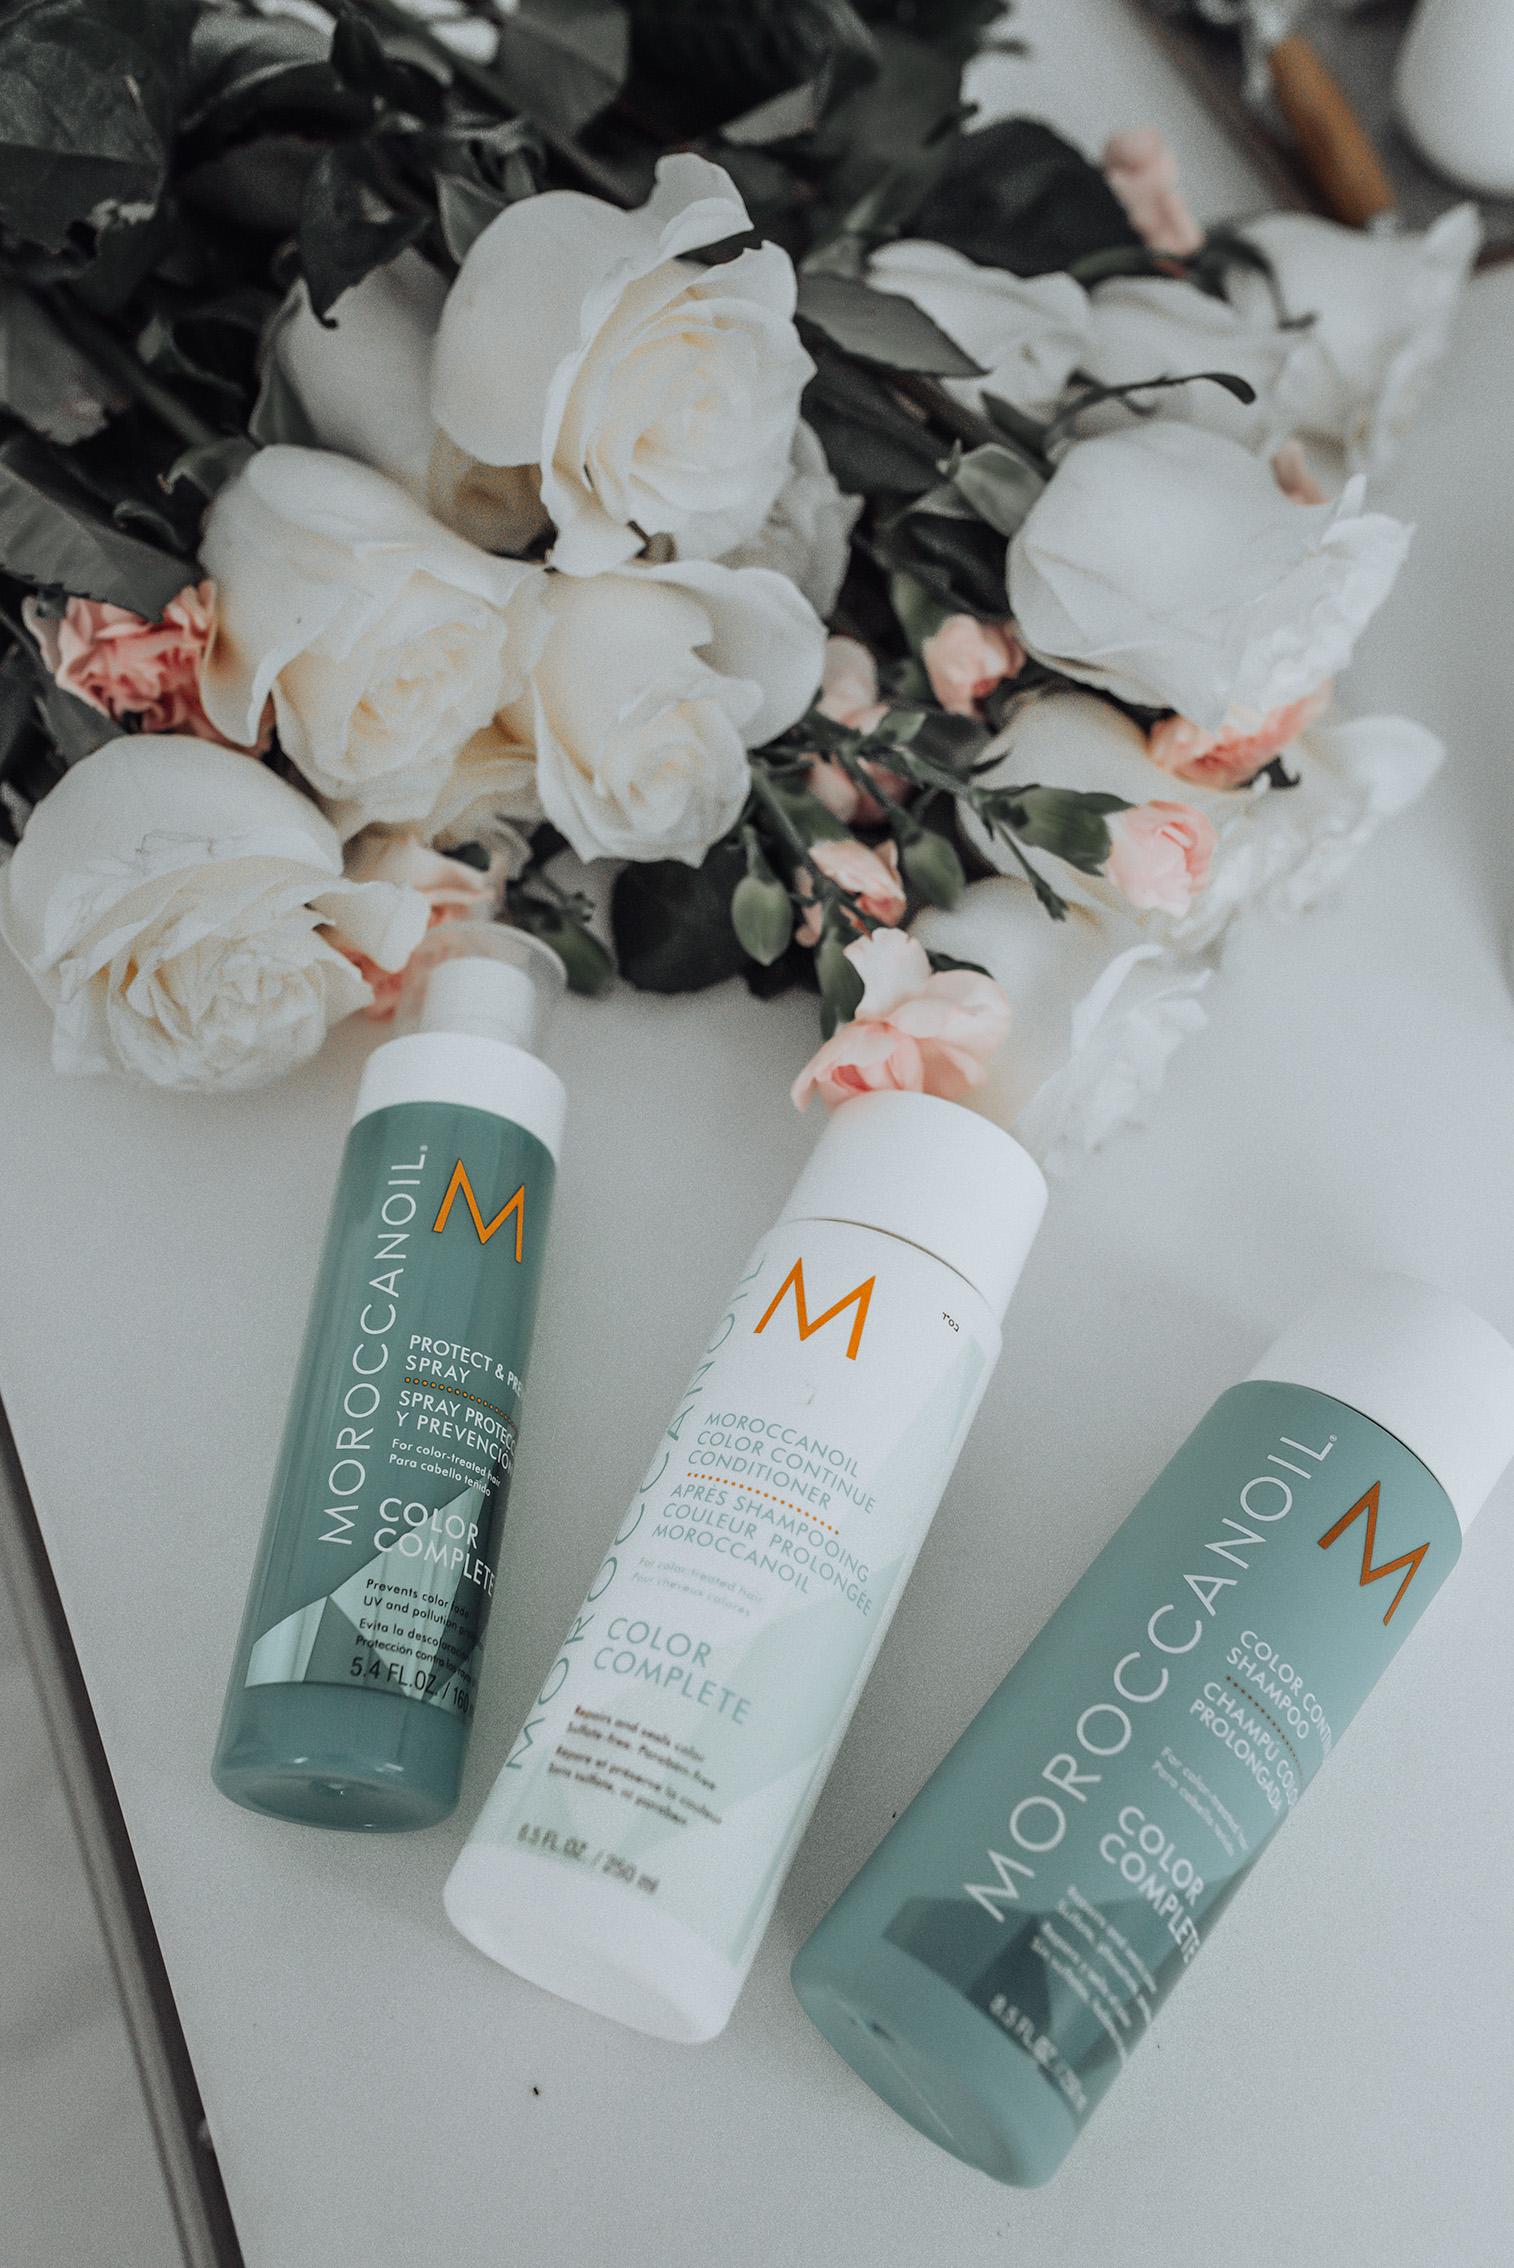 long lasting hair color | Color Continue Shampoo | Color Continue Conditioner | Protect & Prevent Spray